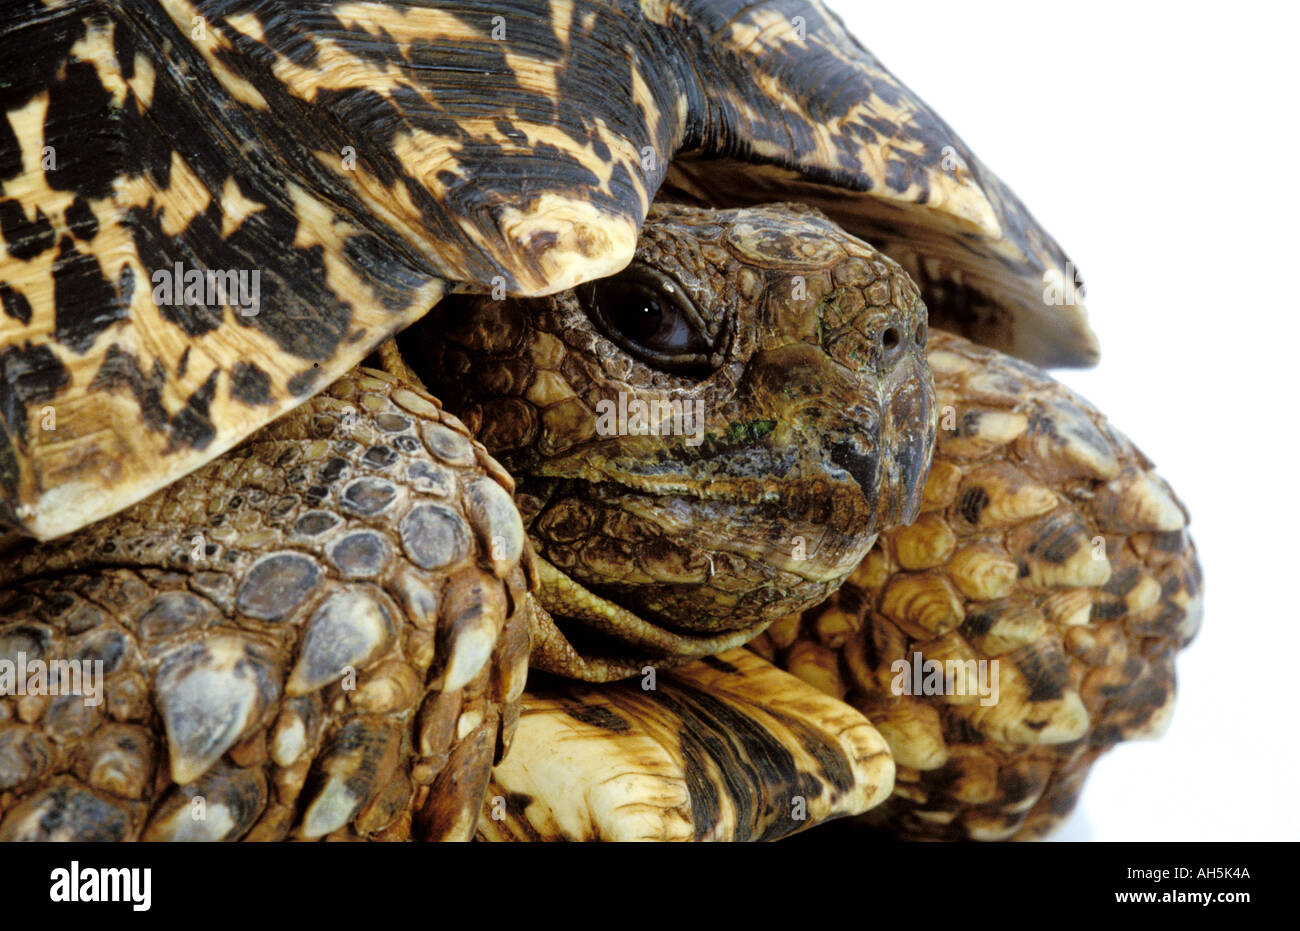 Turtle Tortue Leopard Geochelone Pardalis Labat Rouquette VWPics com - Stock Image